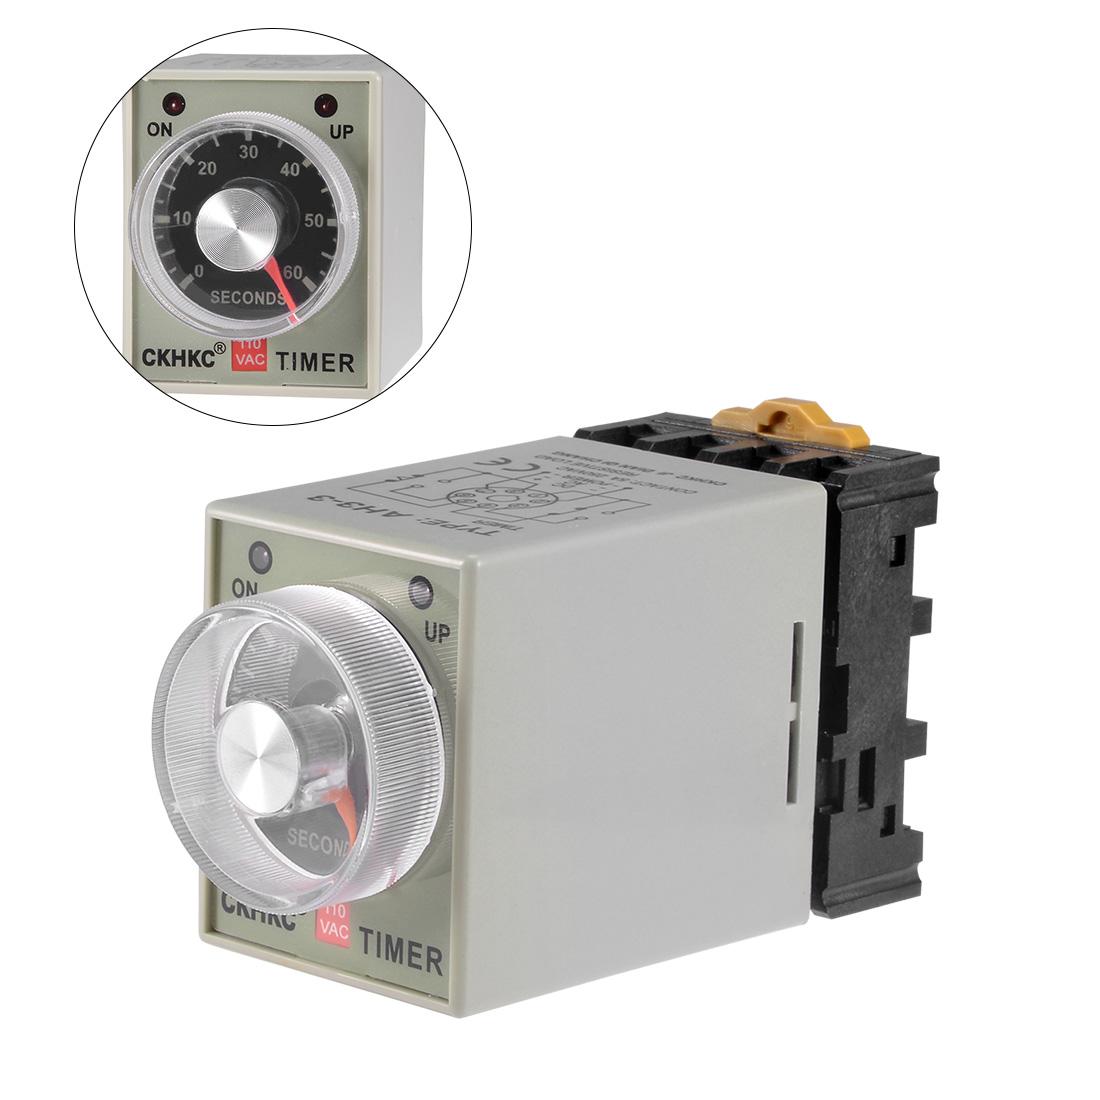 AC110V 60S 8 Terminals Range Adjustable Delay Timer Time Relay AH3-3